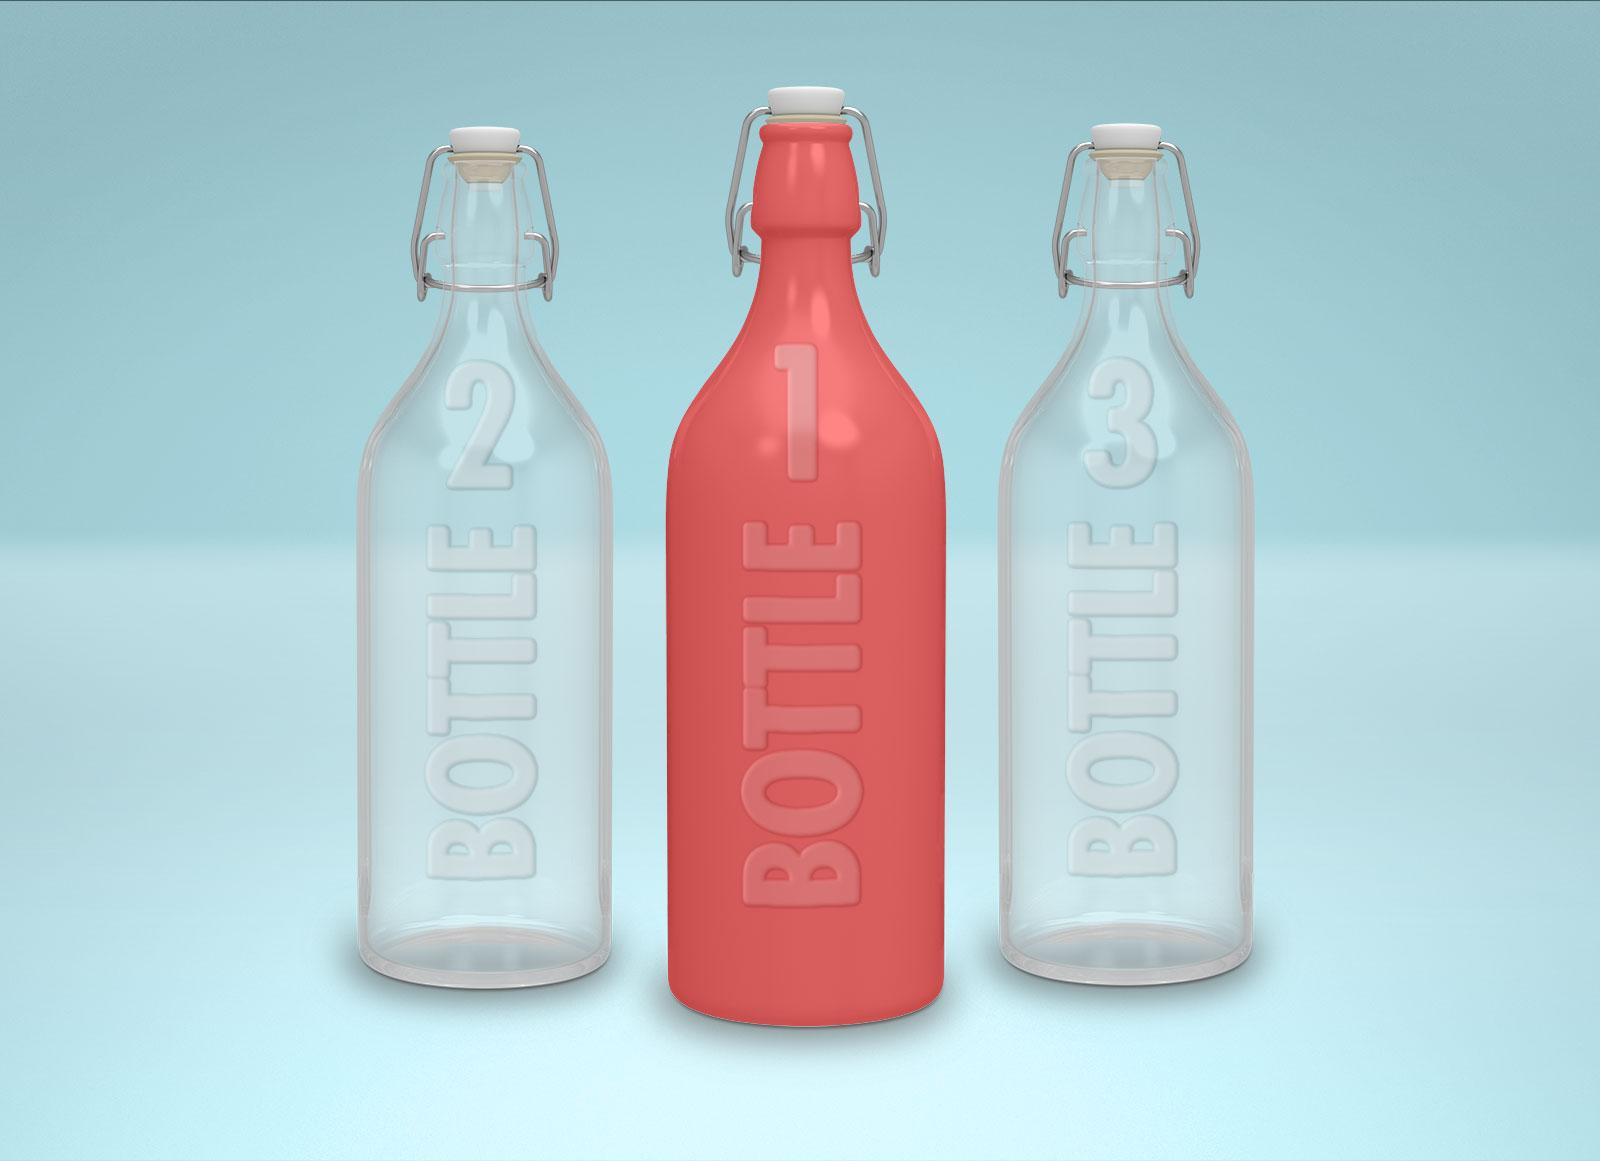 Free-Swing-Cap-Opaque-&-Transparent-Bottle-Mockup-PSD